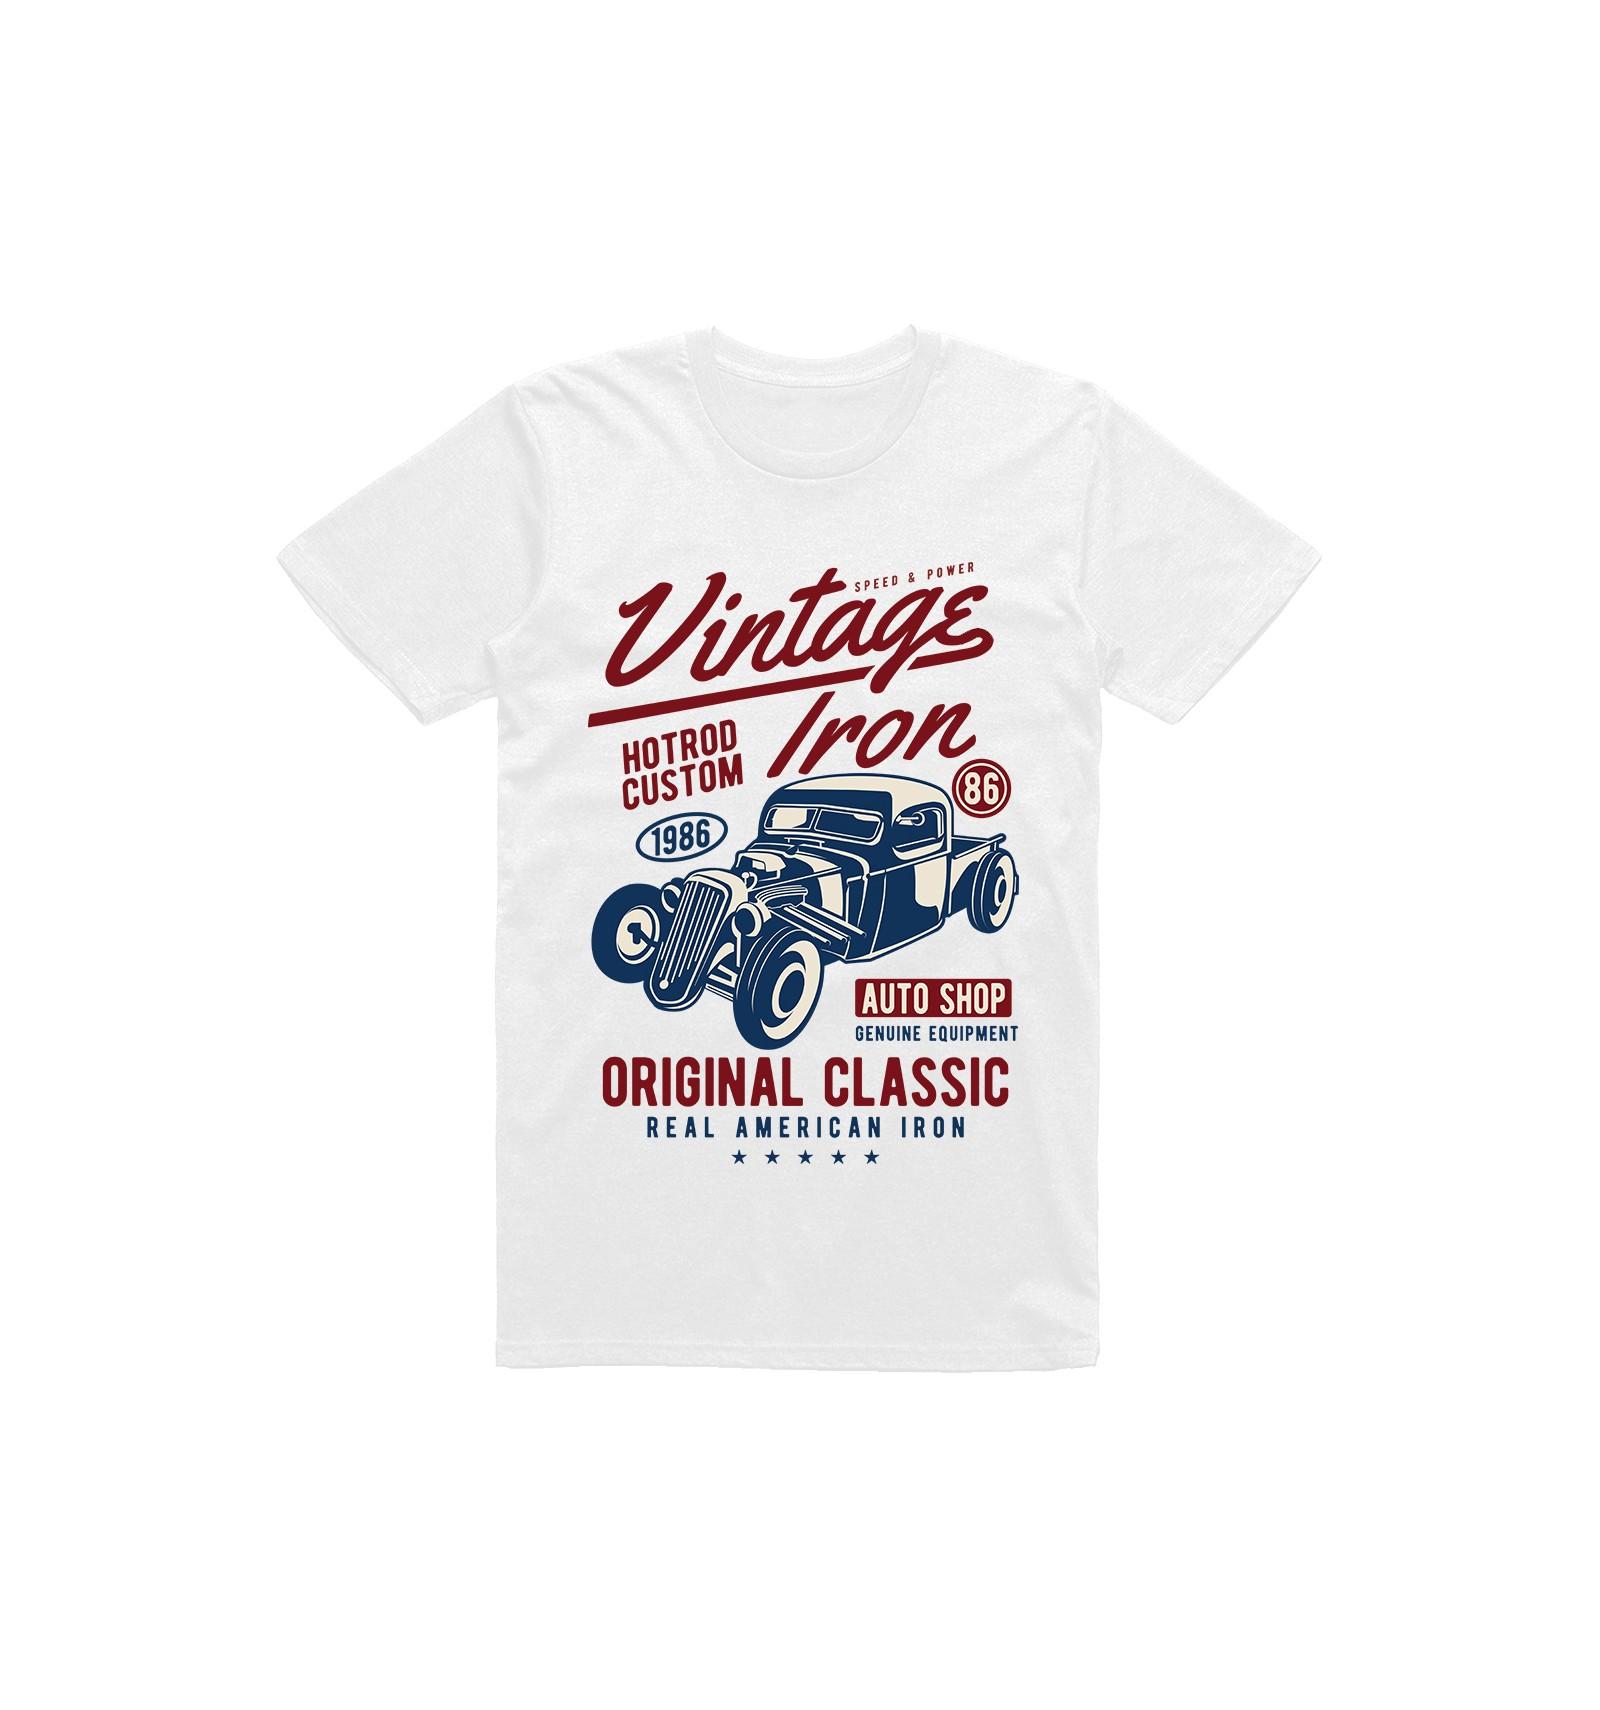 e56bde7453e3 Pánské tričko American muscle - Gentlemansgarage.cz